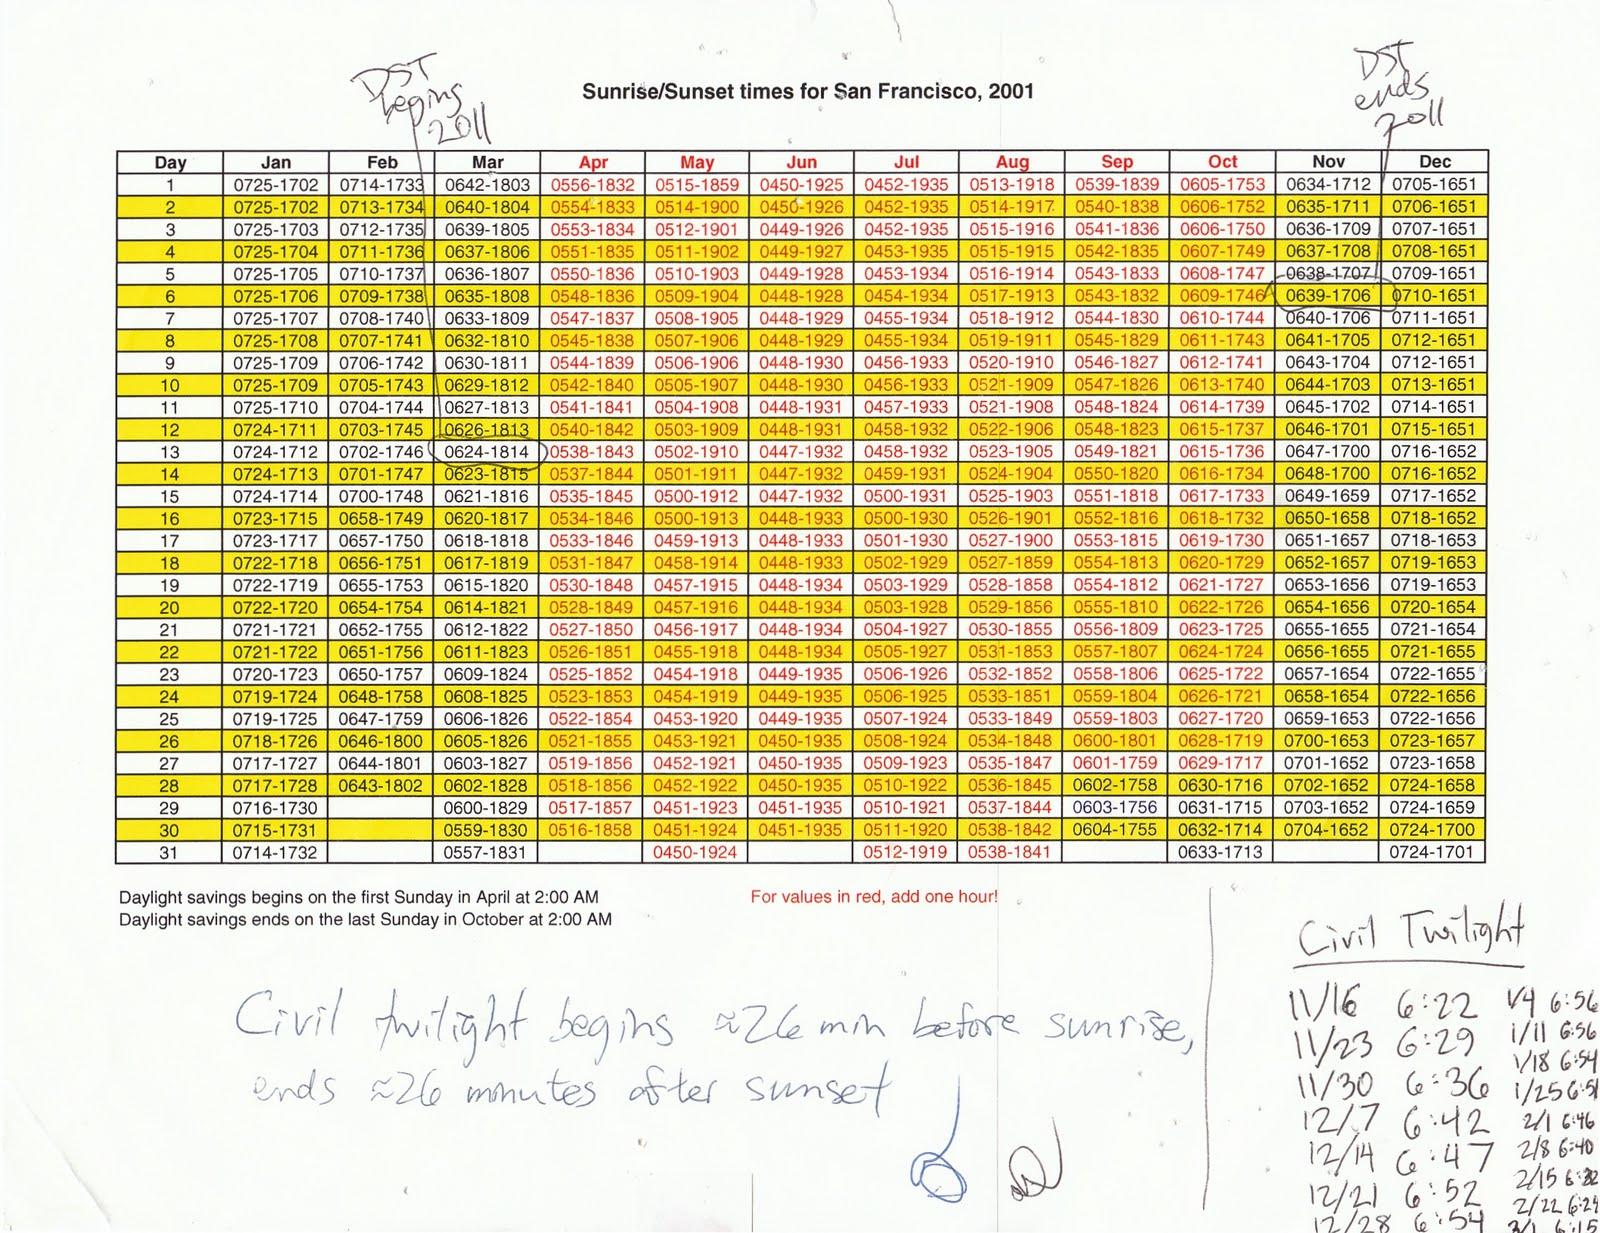 Chart Of Sunrise And Sunset Timeszip Code - Trinity Regarding Sunset Times By Zip Code 2020